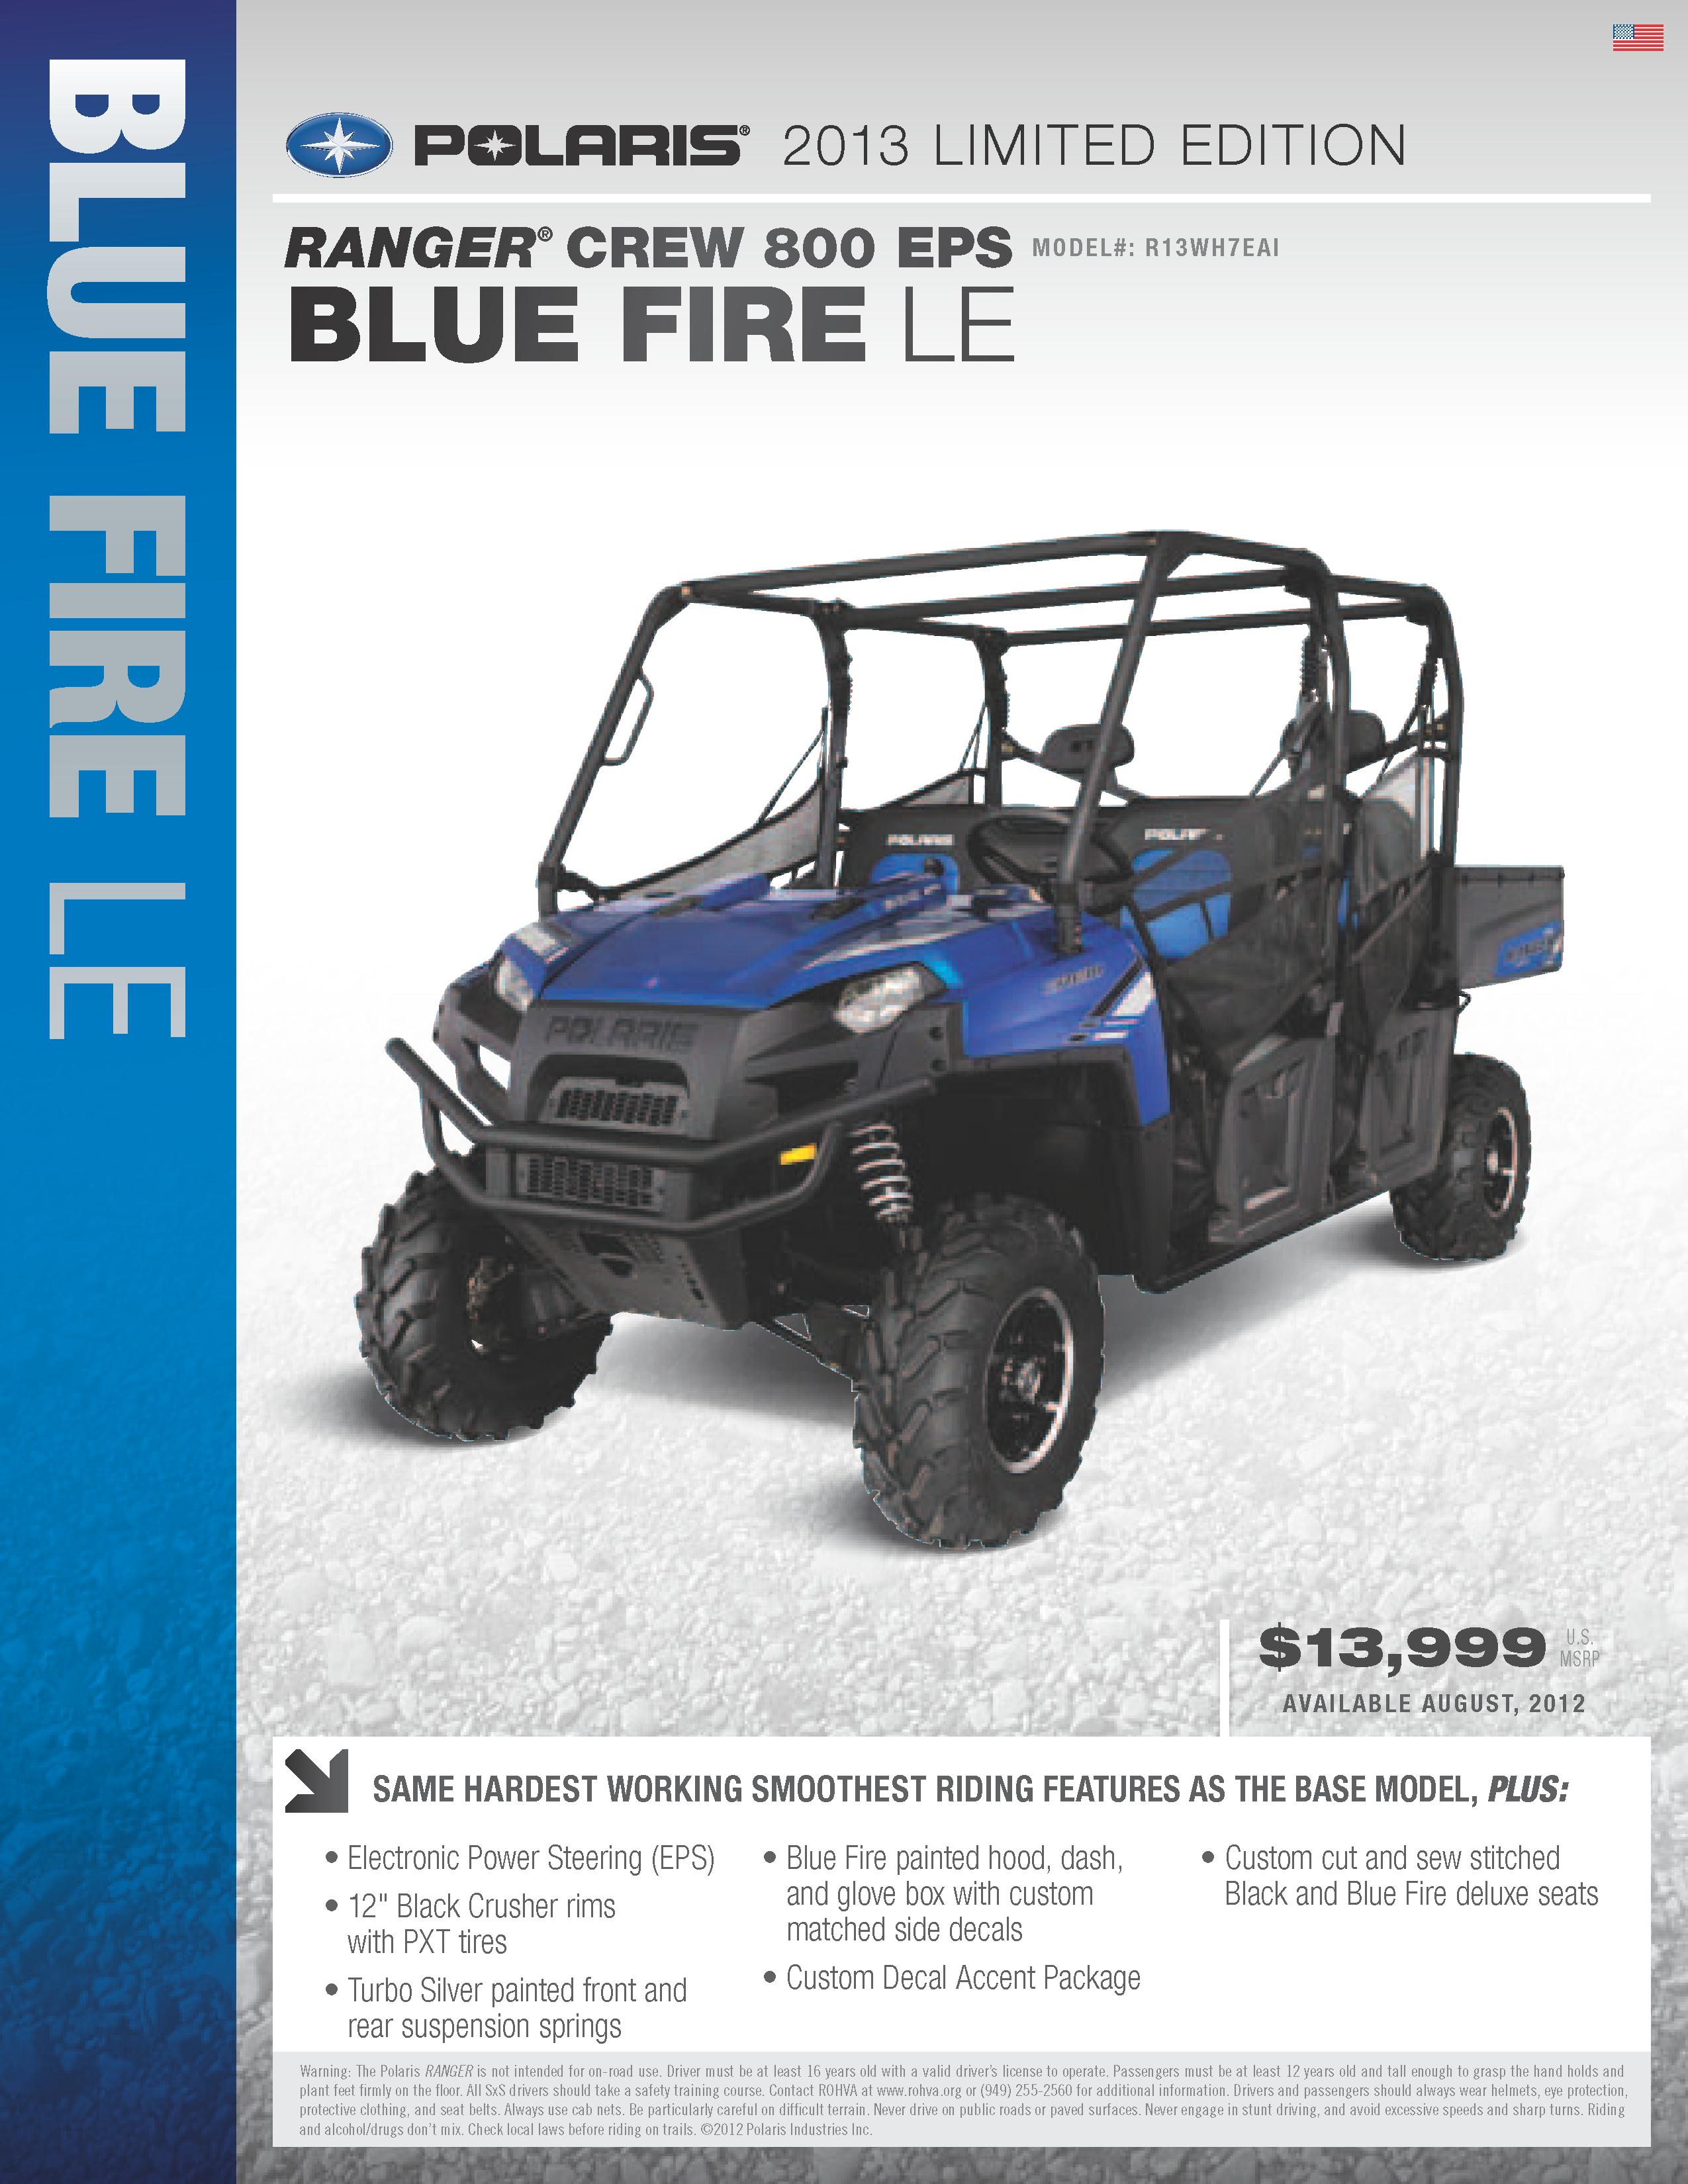 2013 Polaris Ranger Crew 800 - Blue Fire LE with EPS